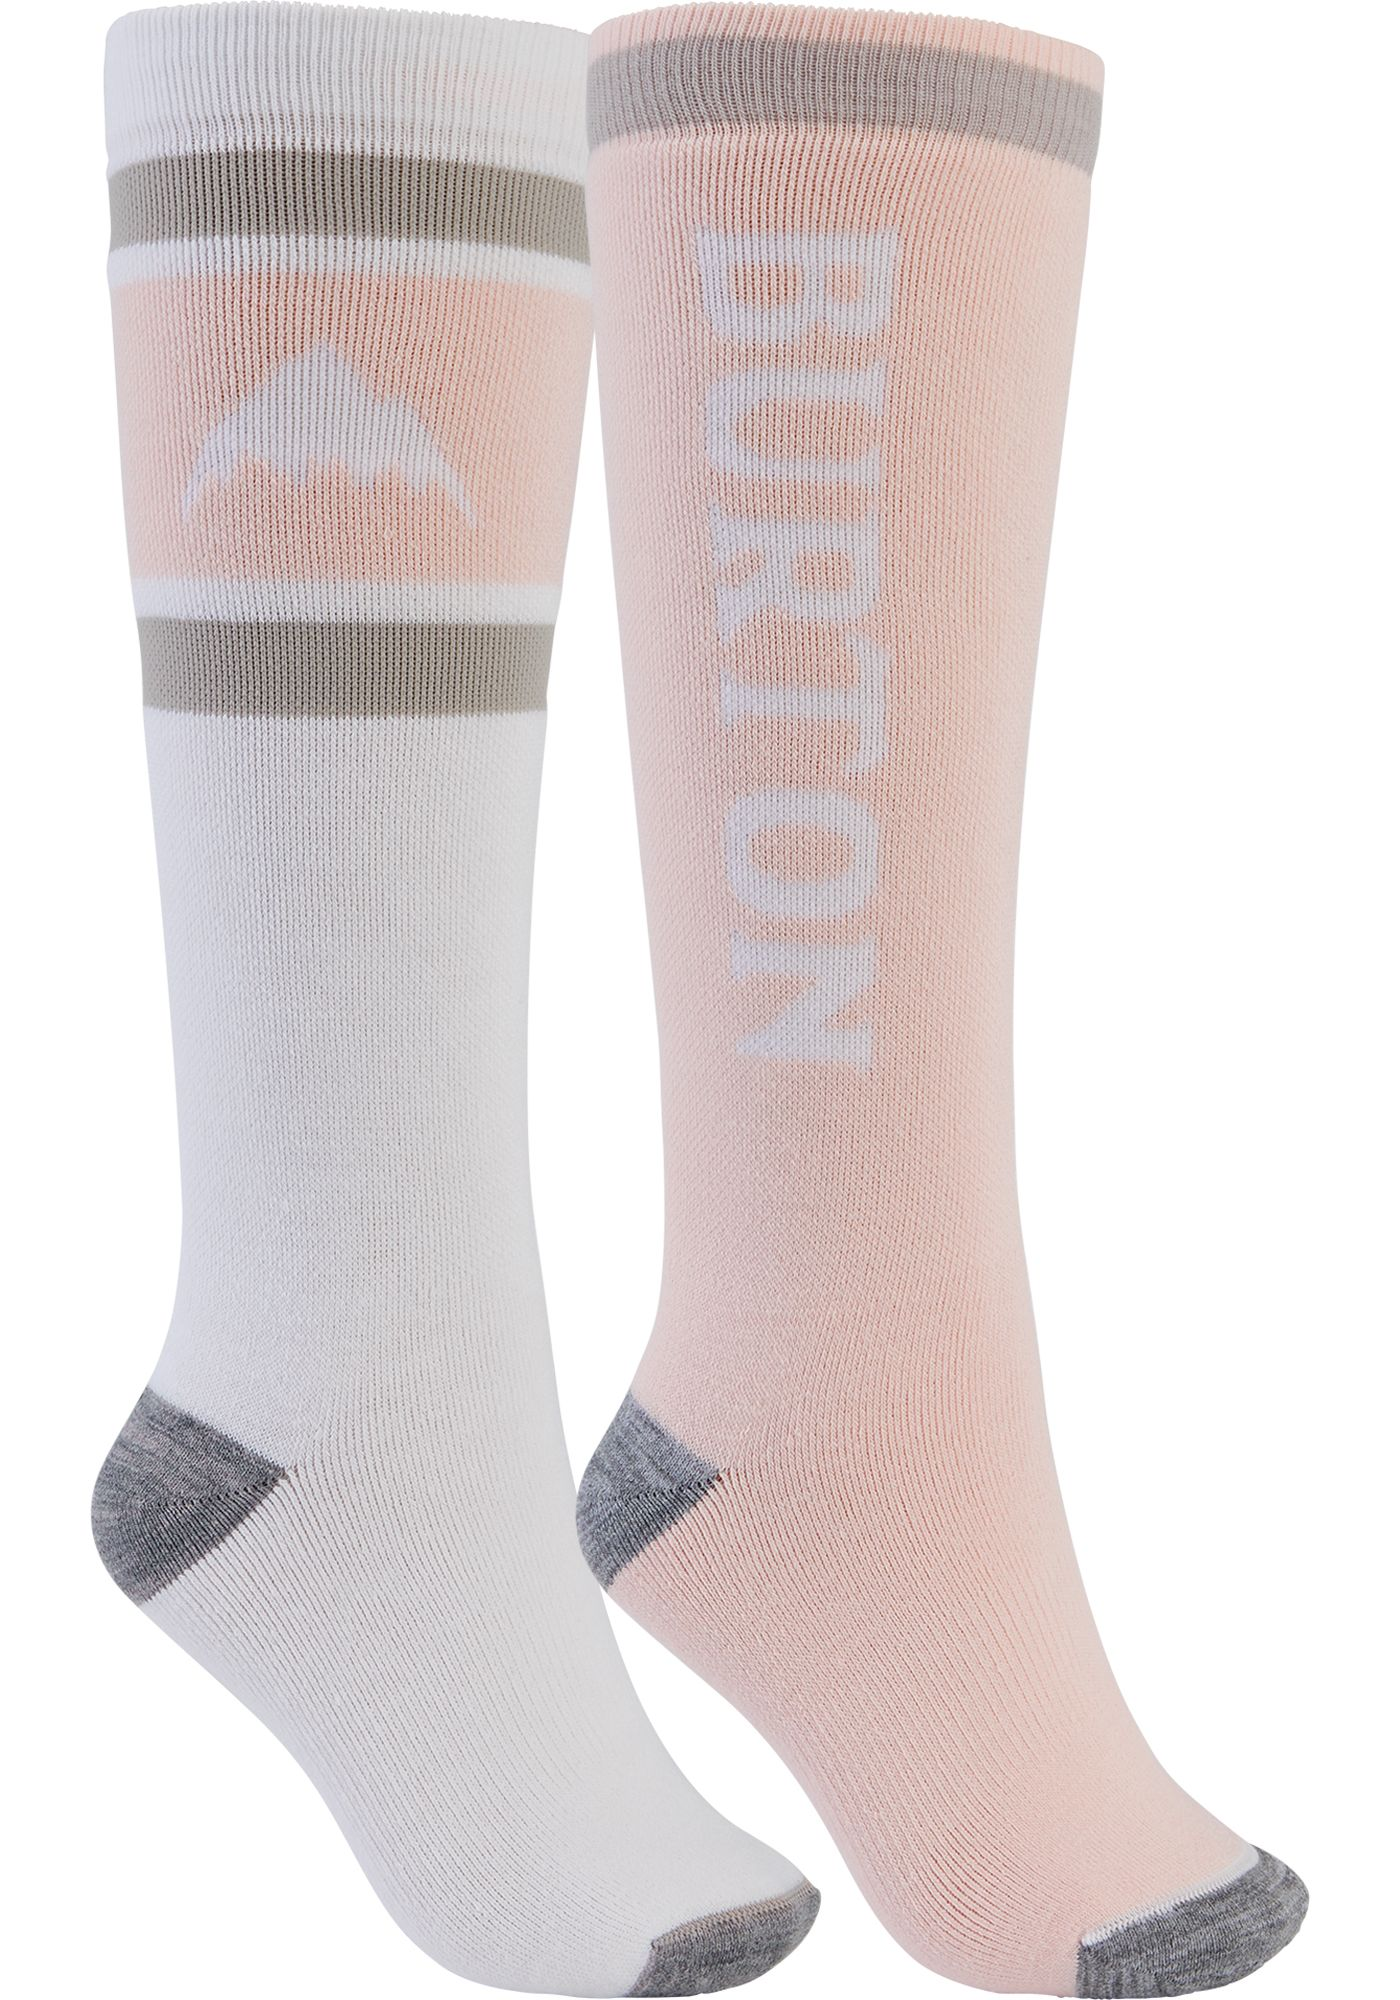 Burton Women's Weekend Socks 2 Pack